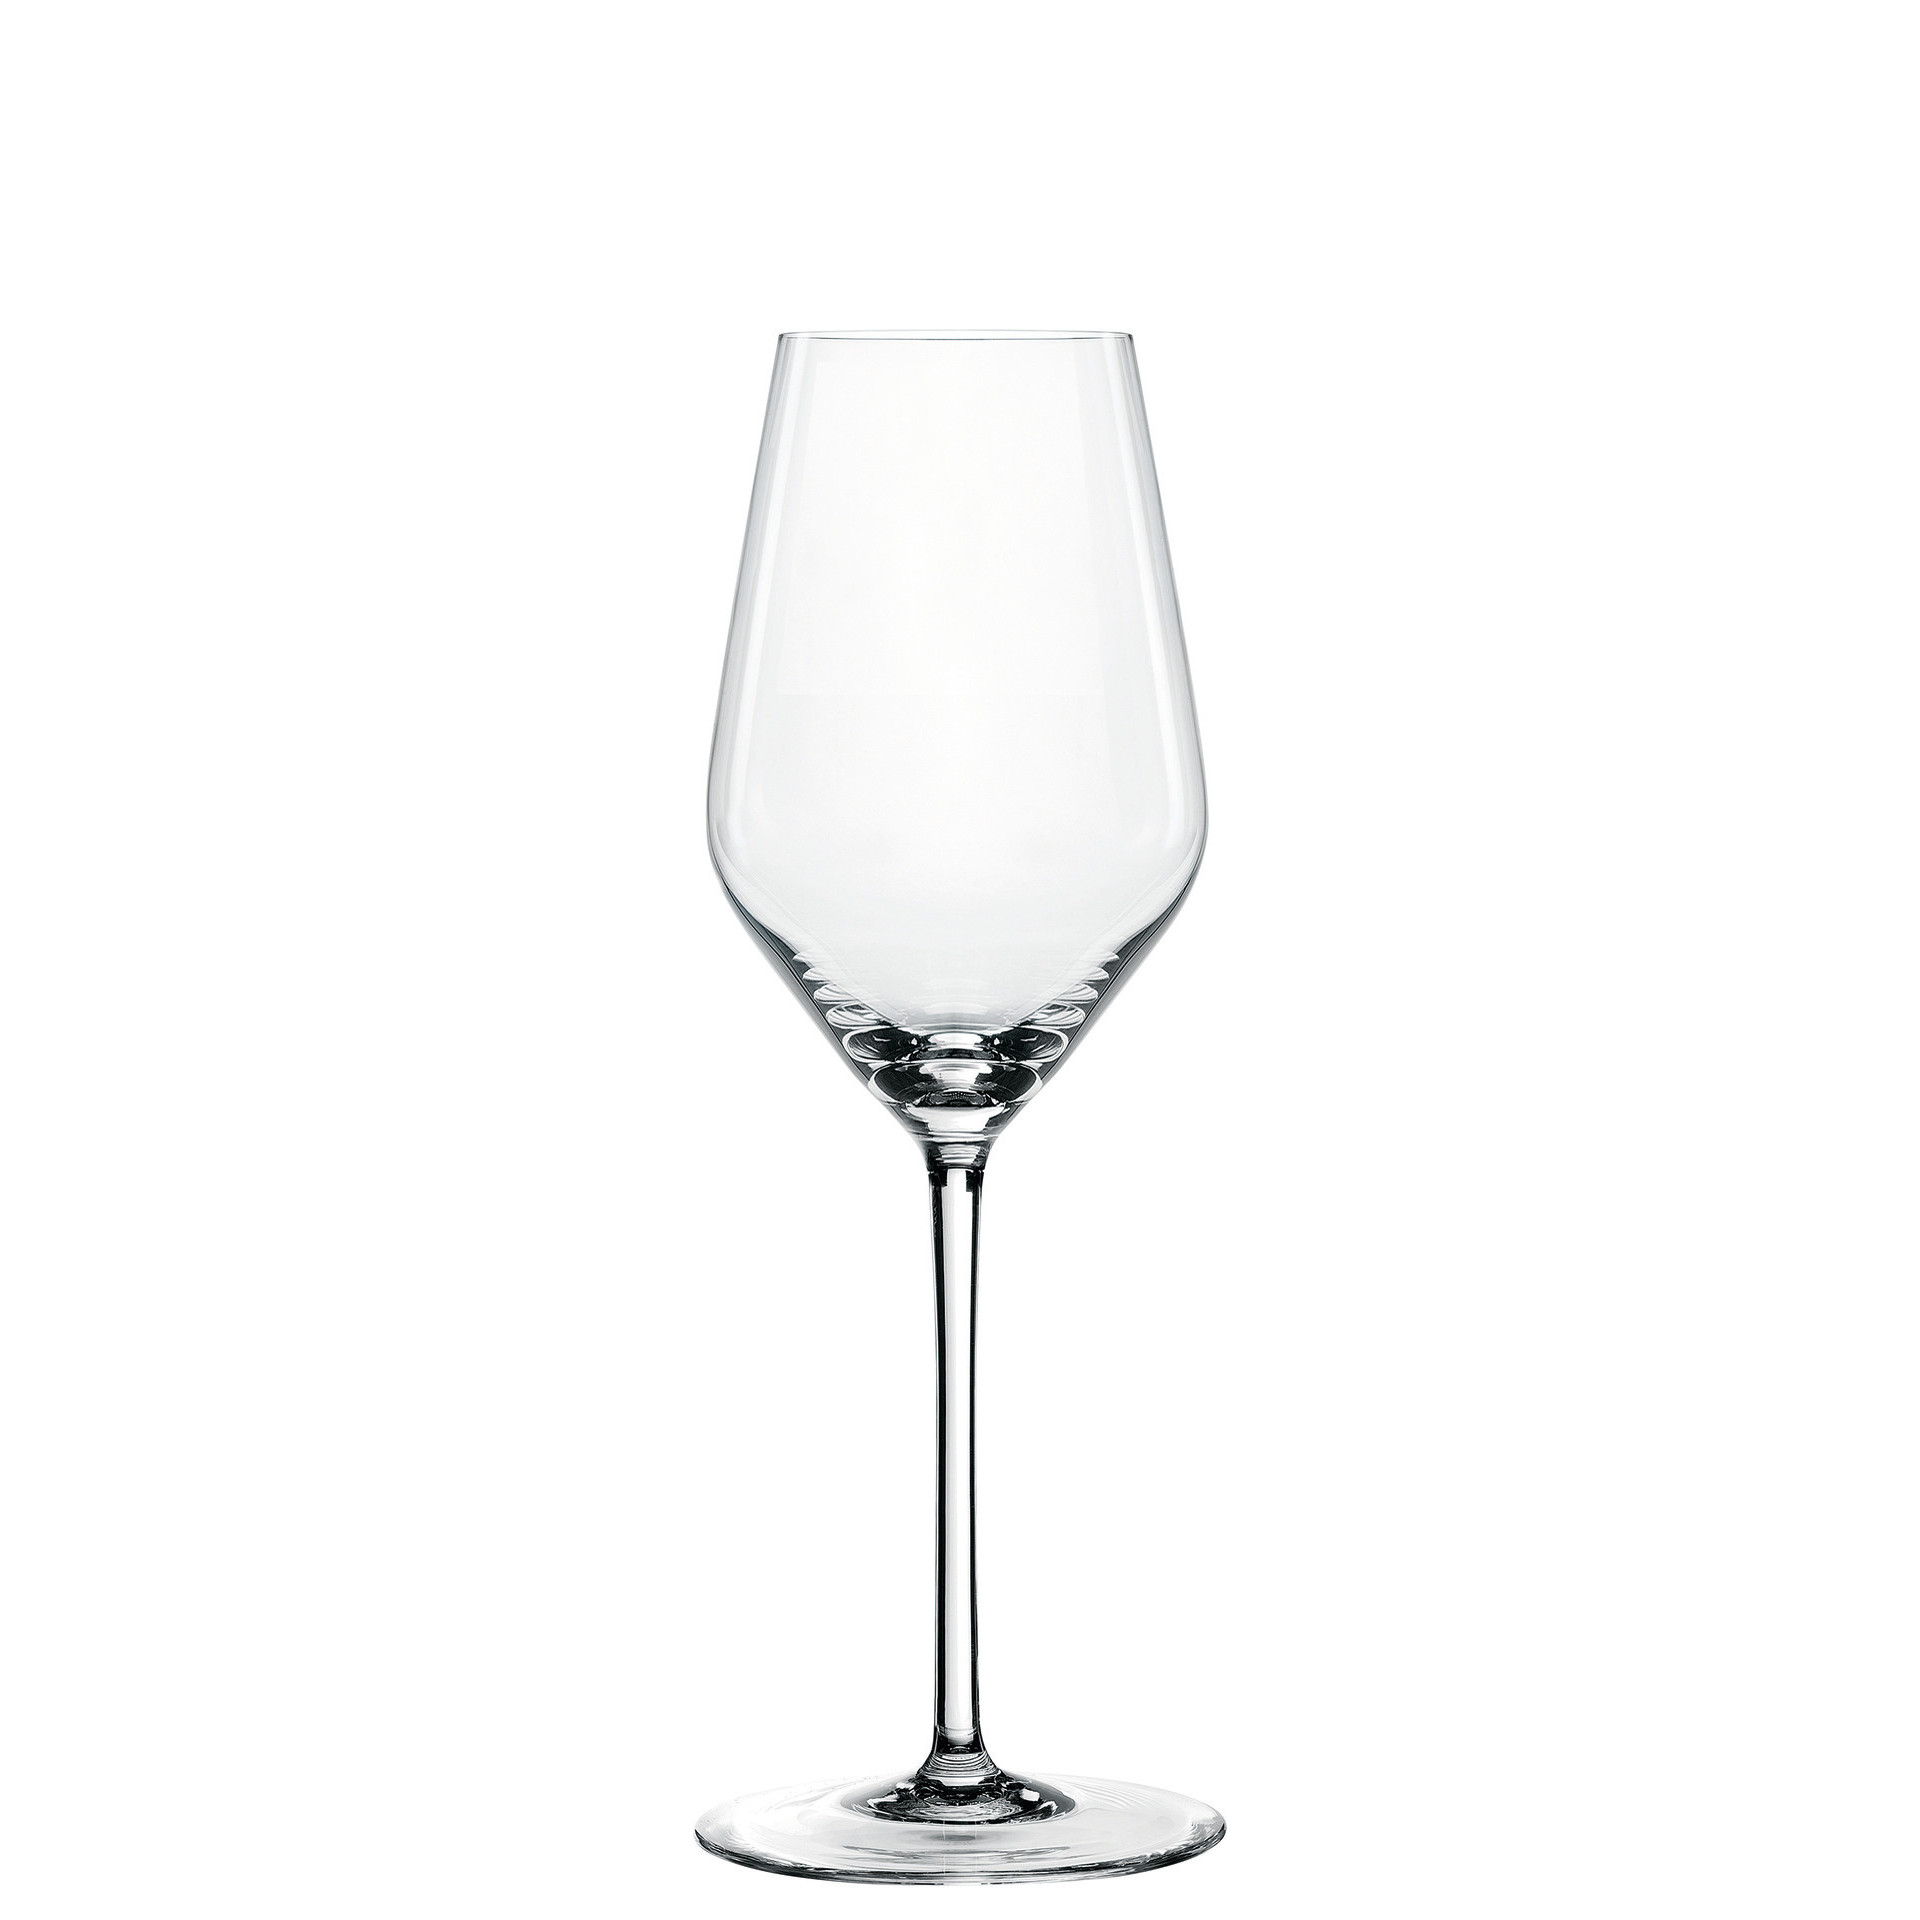 Style, Champagnerglas ø 75 mm / 0,31 l 0,10 /-/